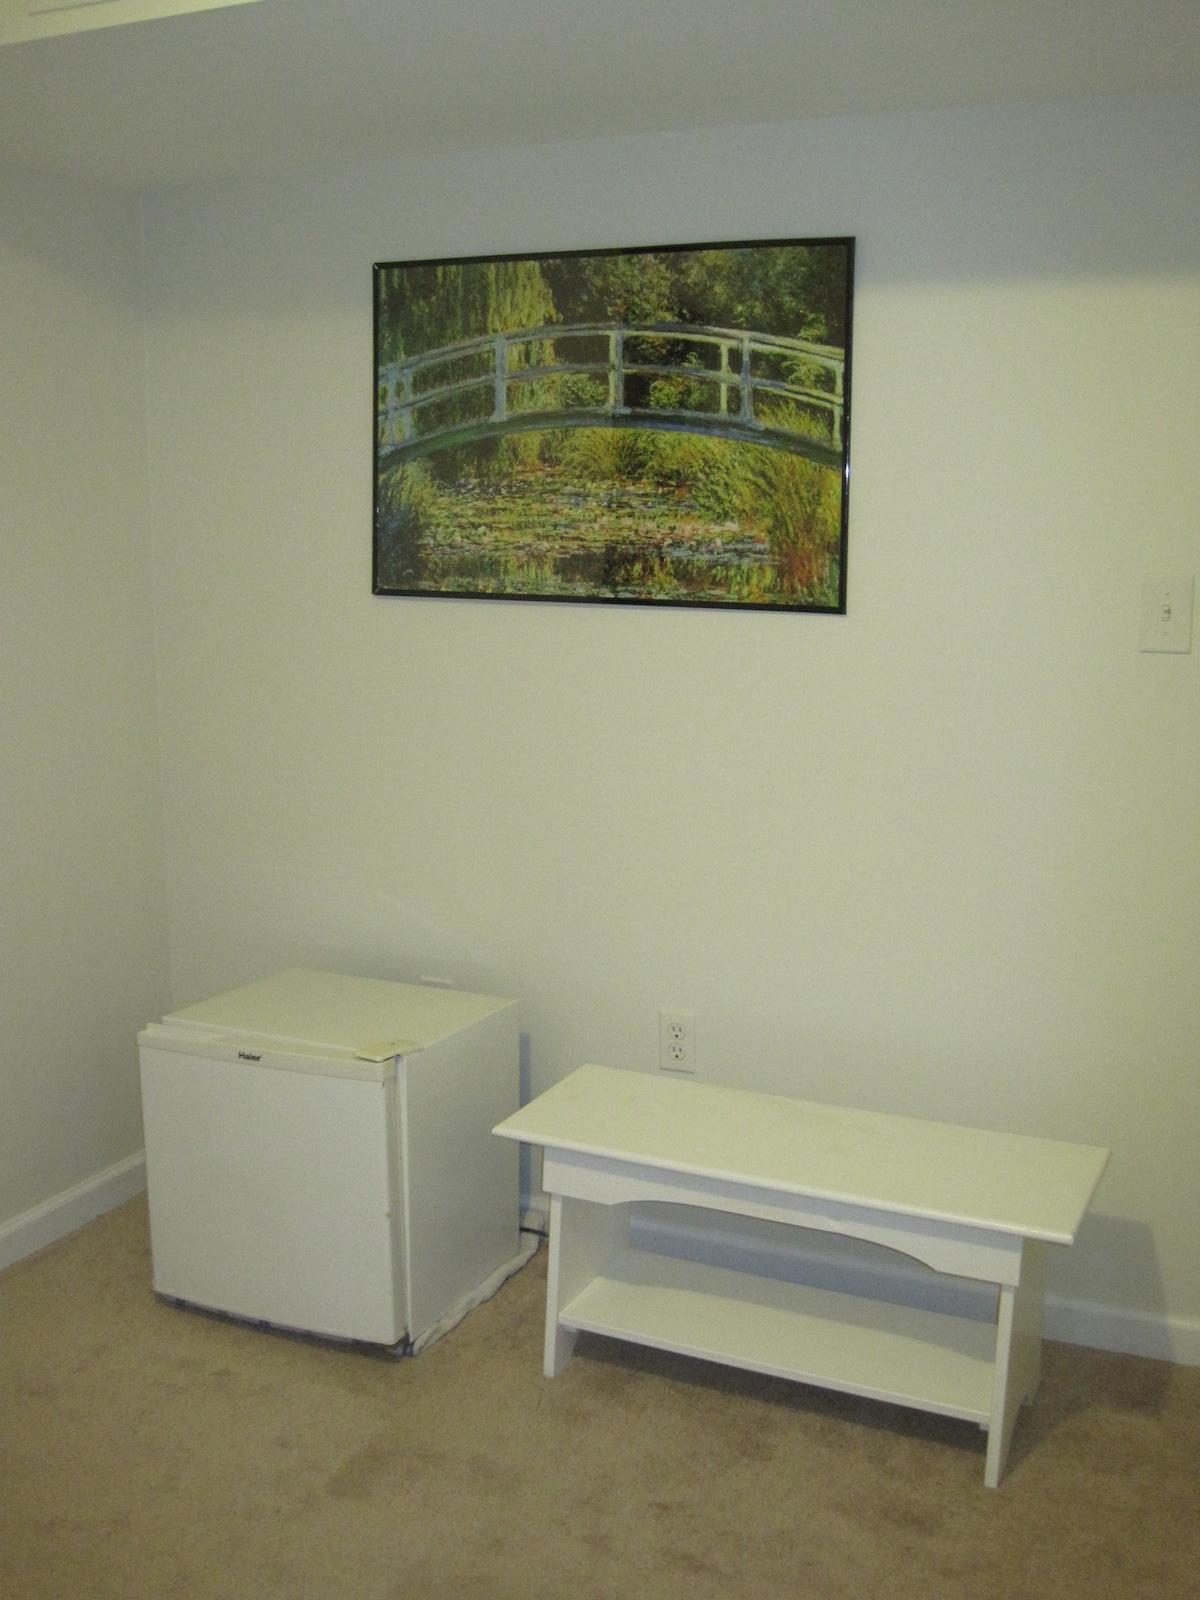 Mini fridge and bench in bedroom.